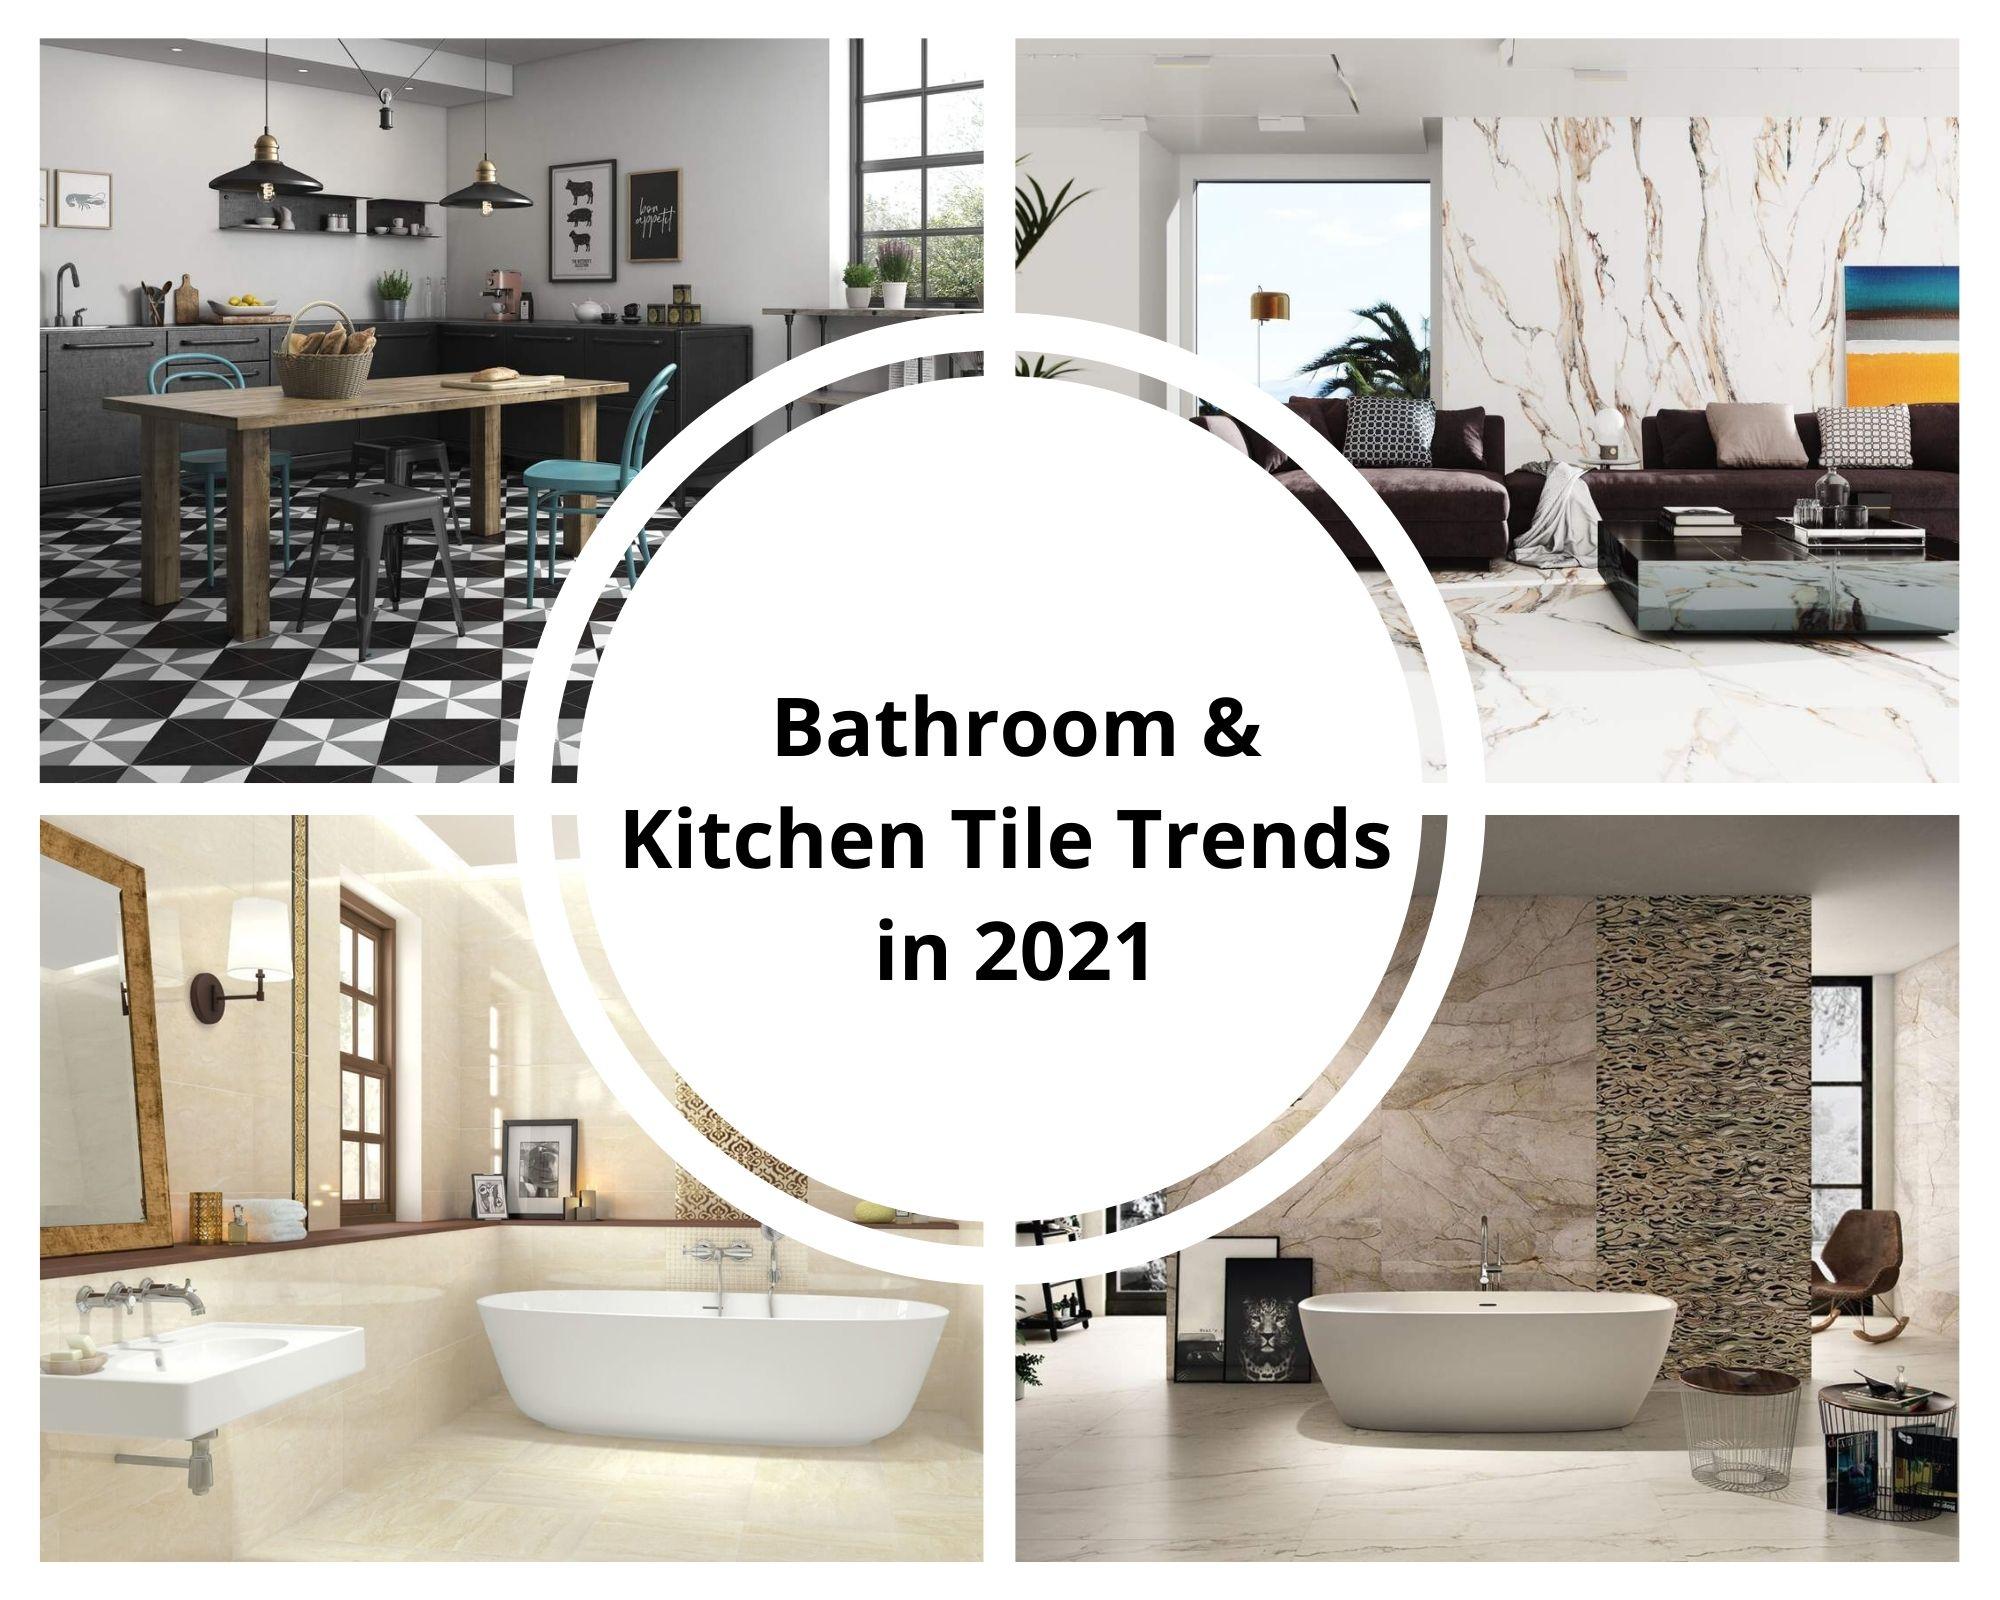 Bathroom & Kitchen Tile Trends in 2021